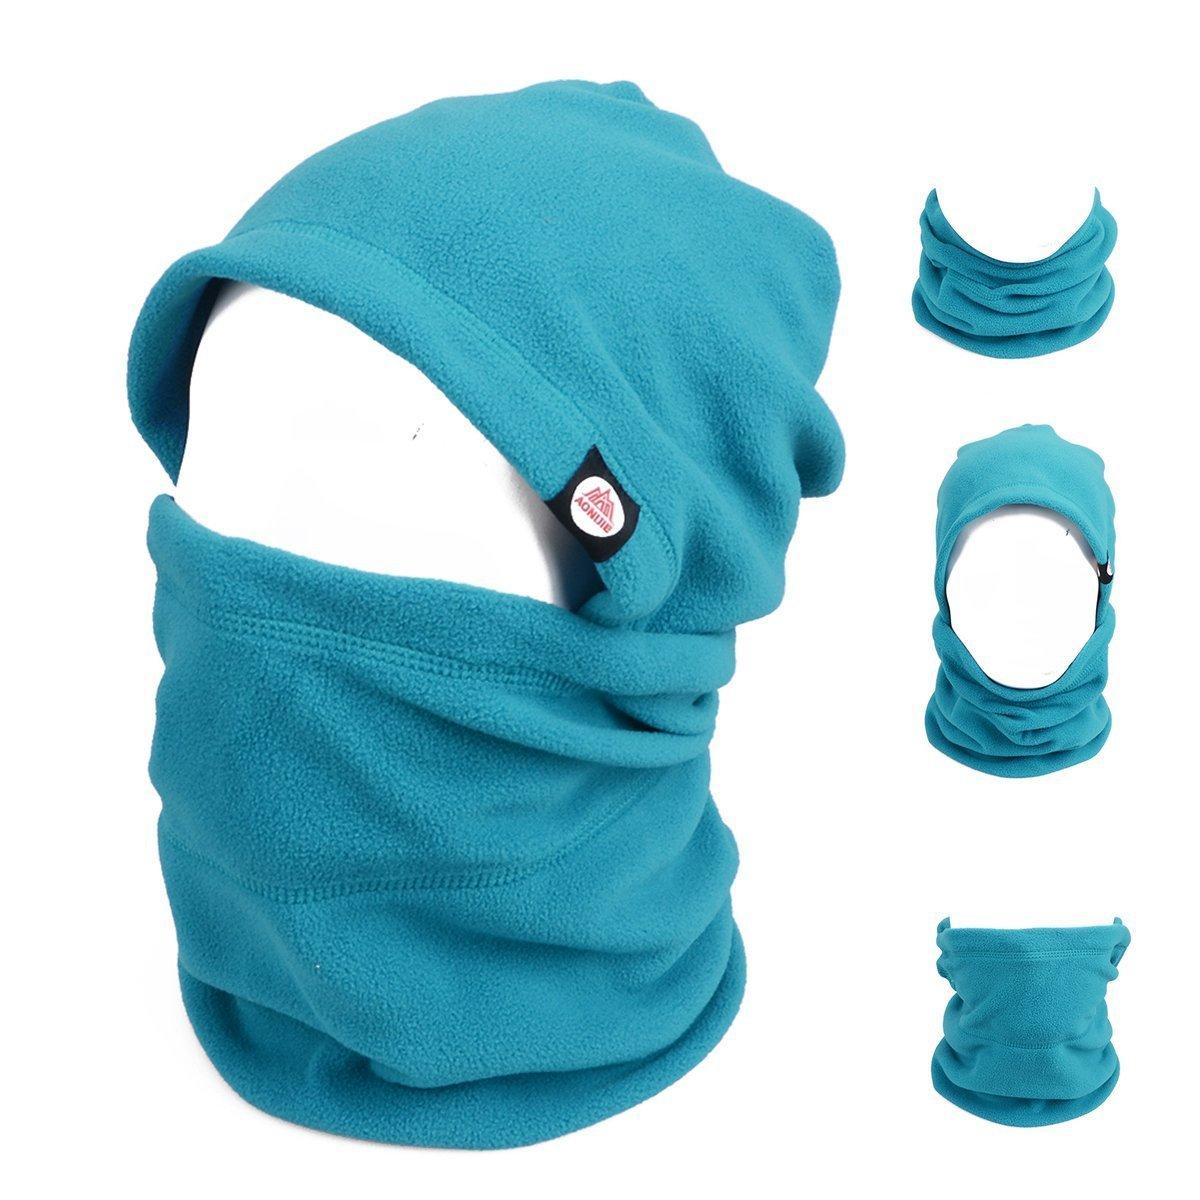 TRIWONDER Balaclava Hood Hat Thermal Fleece Face Mask Neck Warmer Full Face Cover Cap Winter Ski Mask